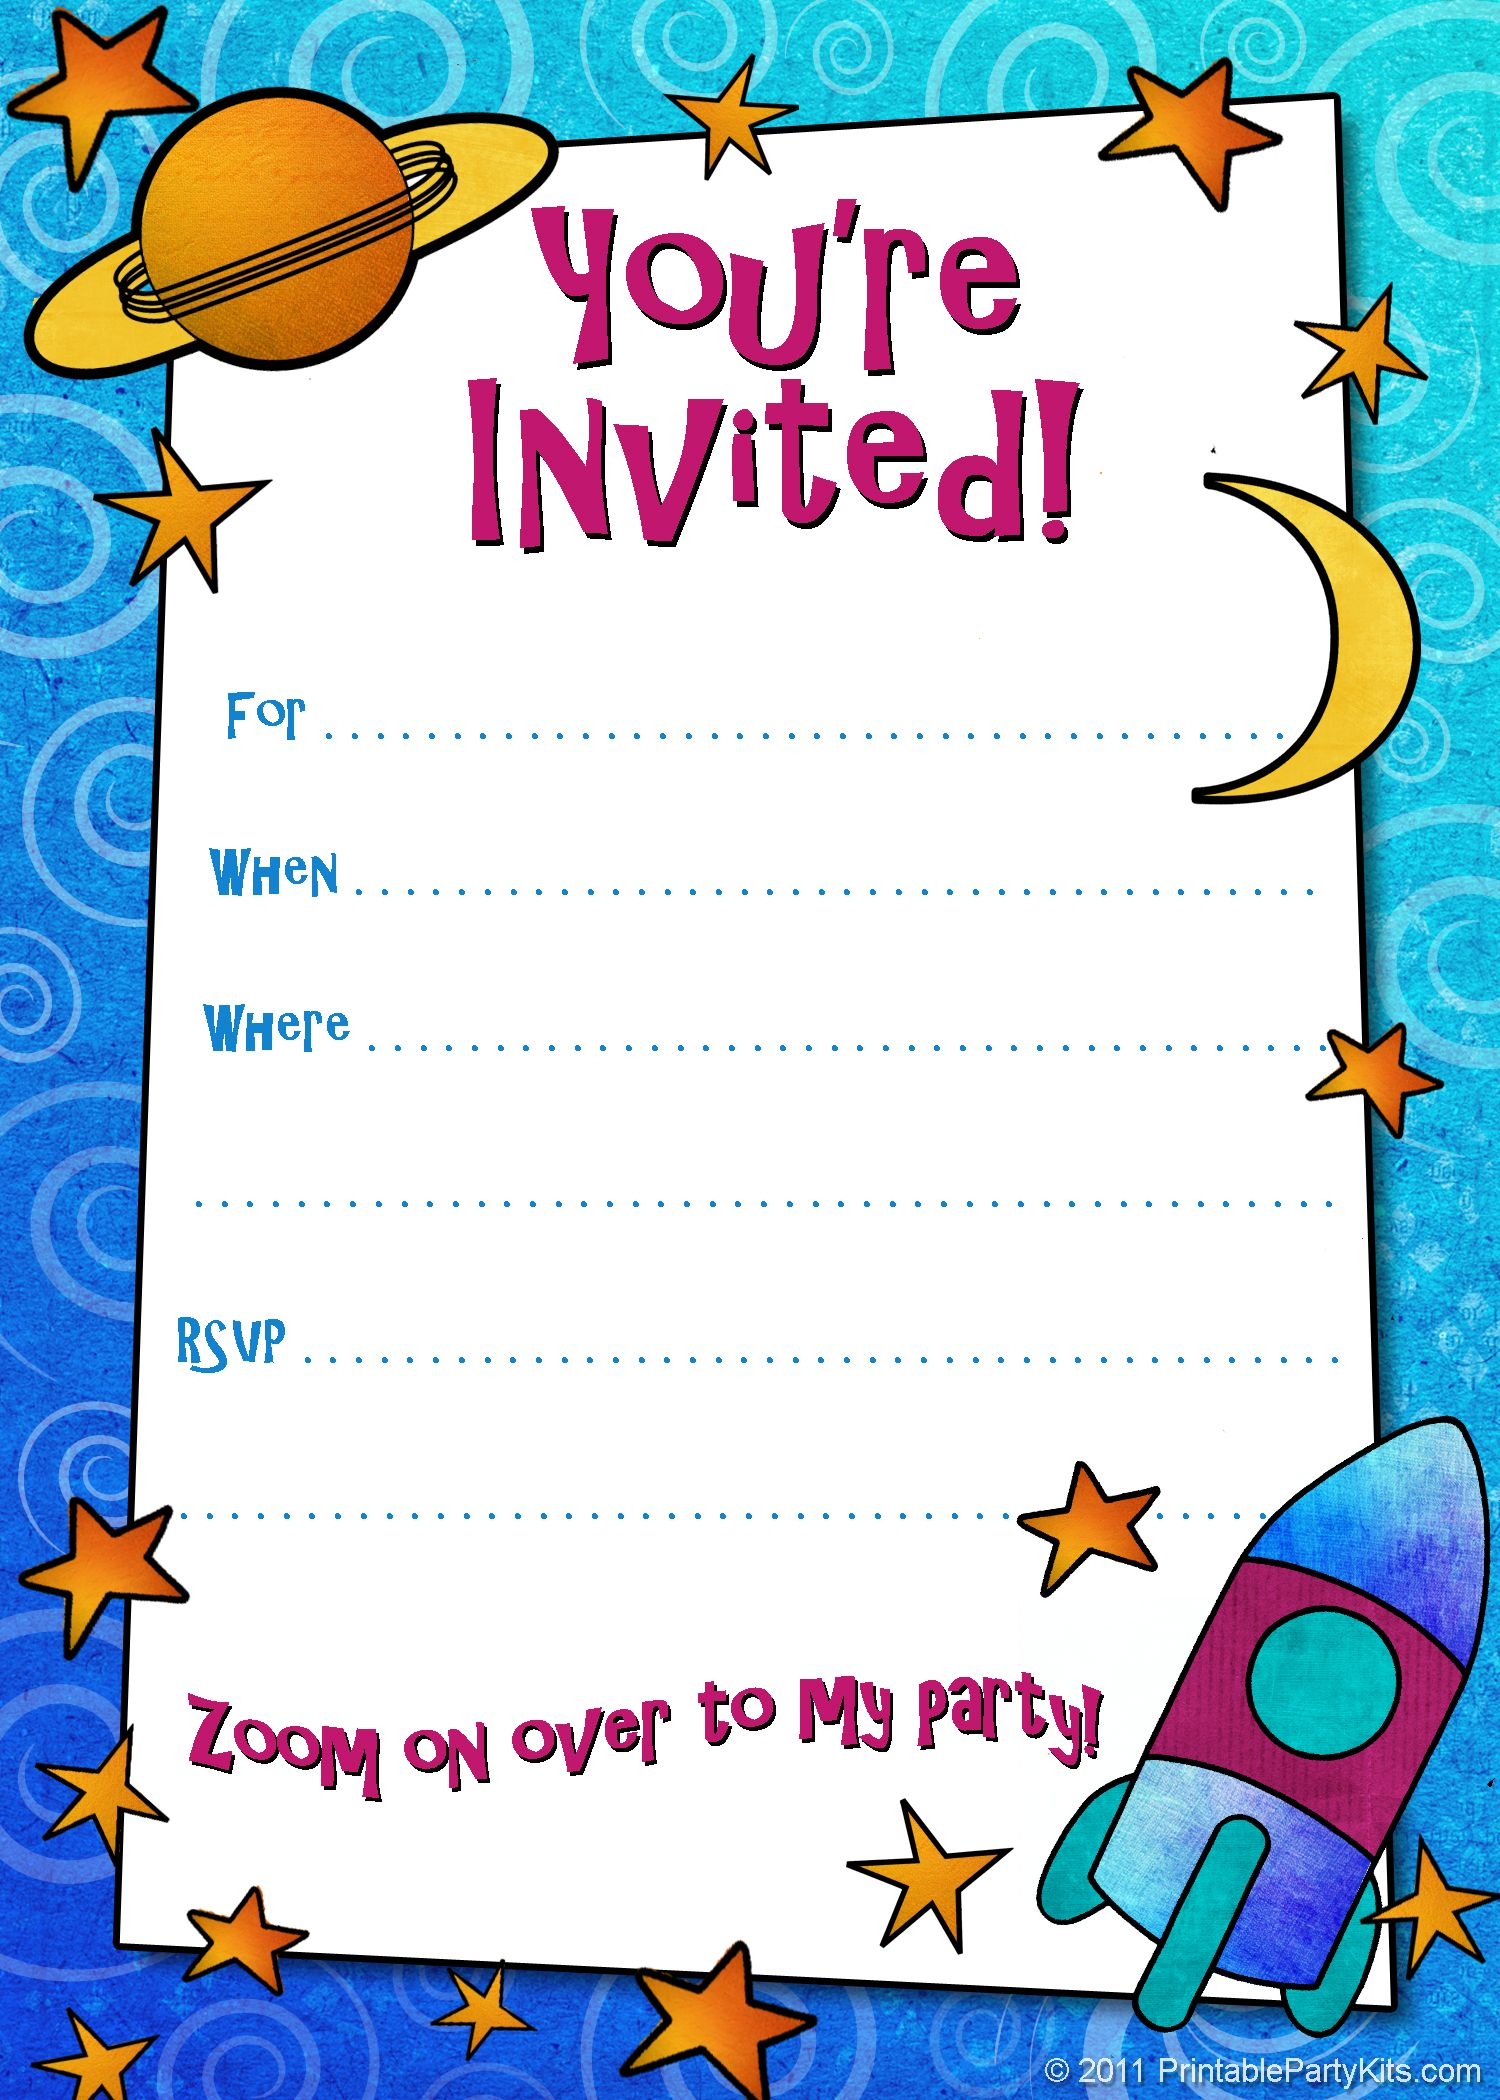 Free Printable Boys Birthday Party Invitations | Birthday Party - Free Printable Boy Birthday Invitations